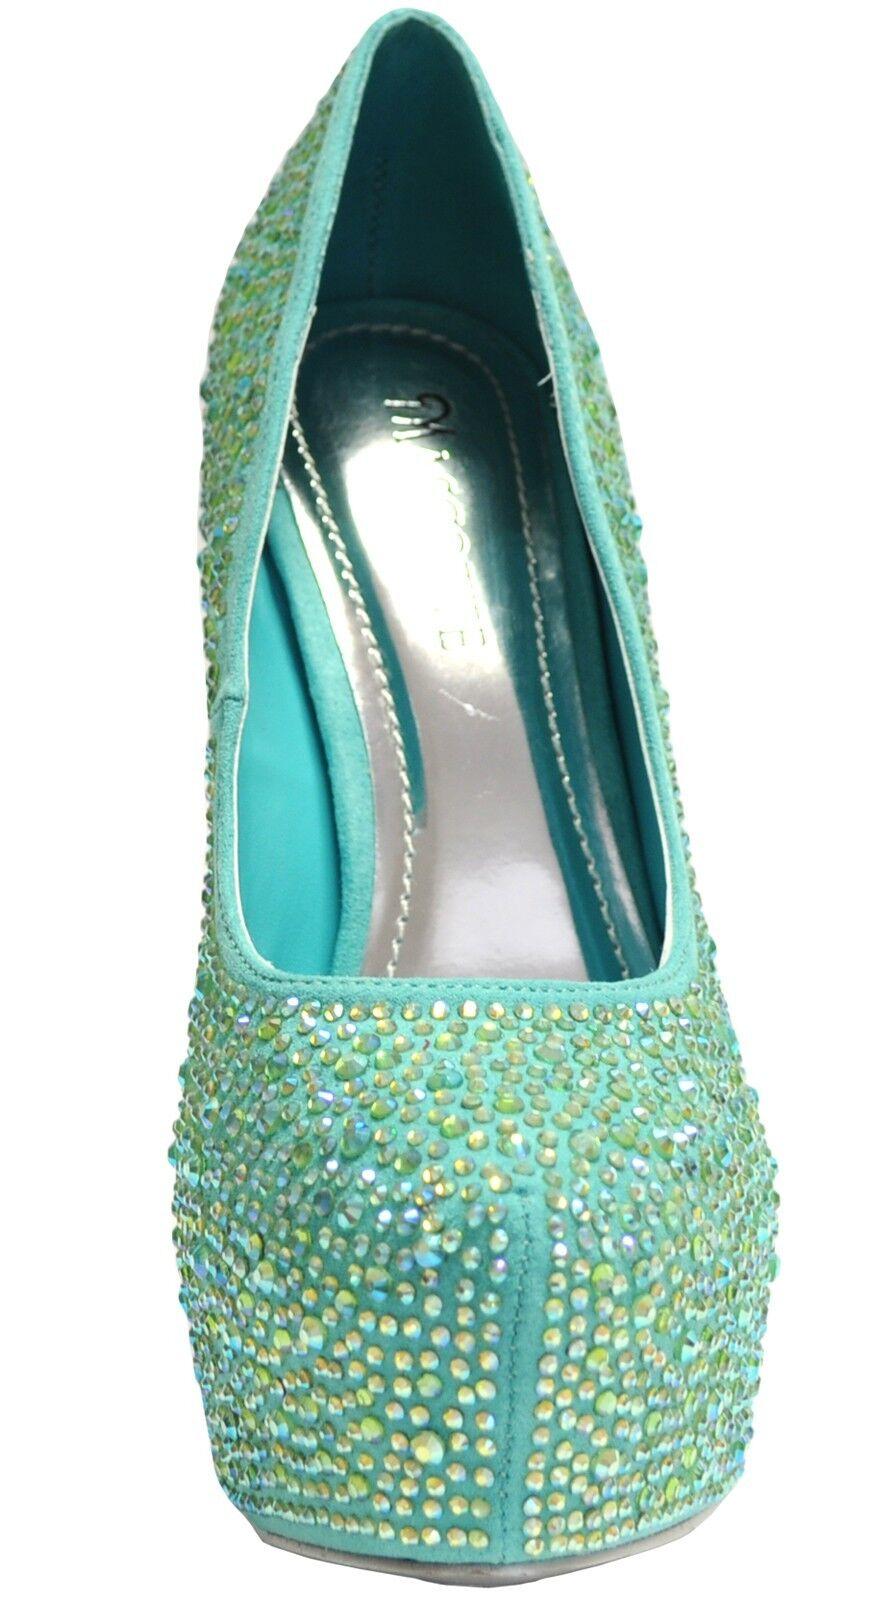 New damen schuhe evening stilettos blink rhinestones prom prom prom wedding mint Grün e52078